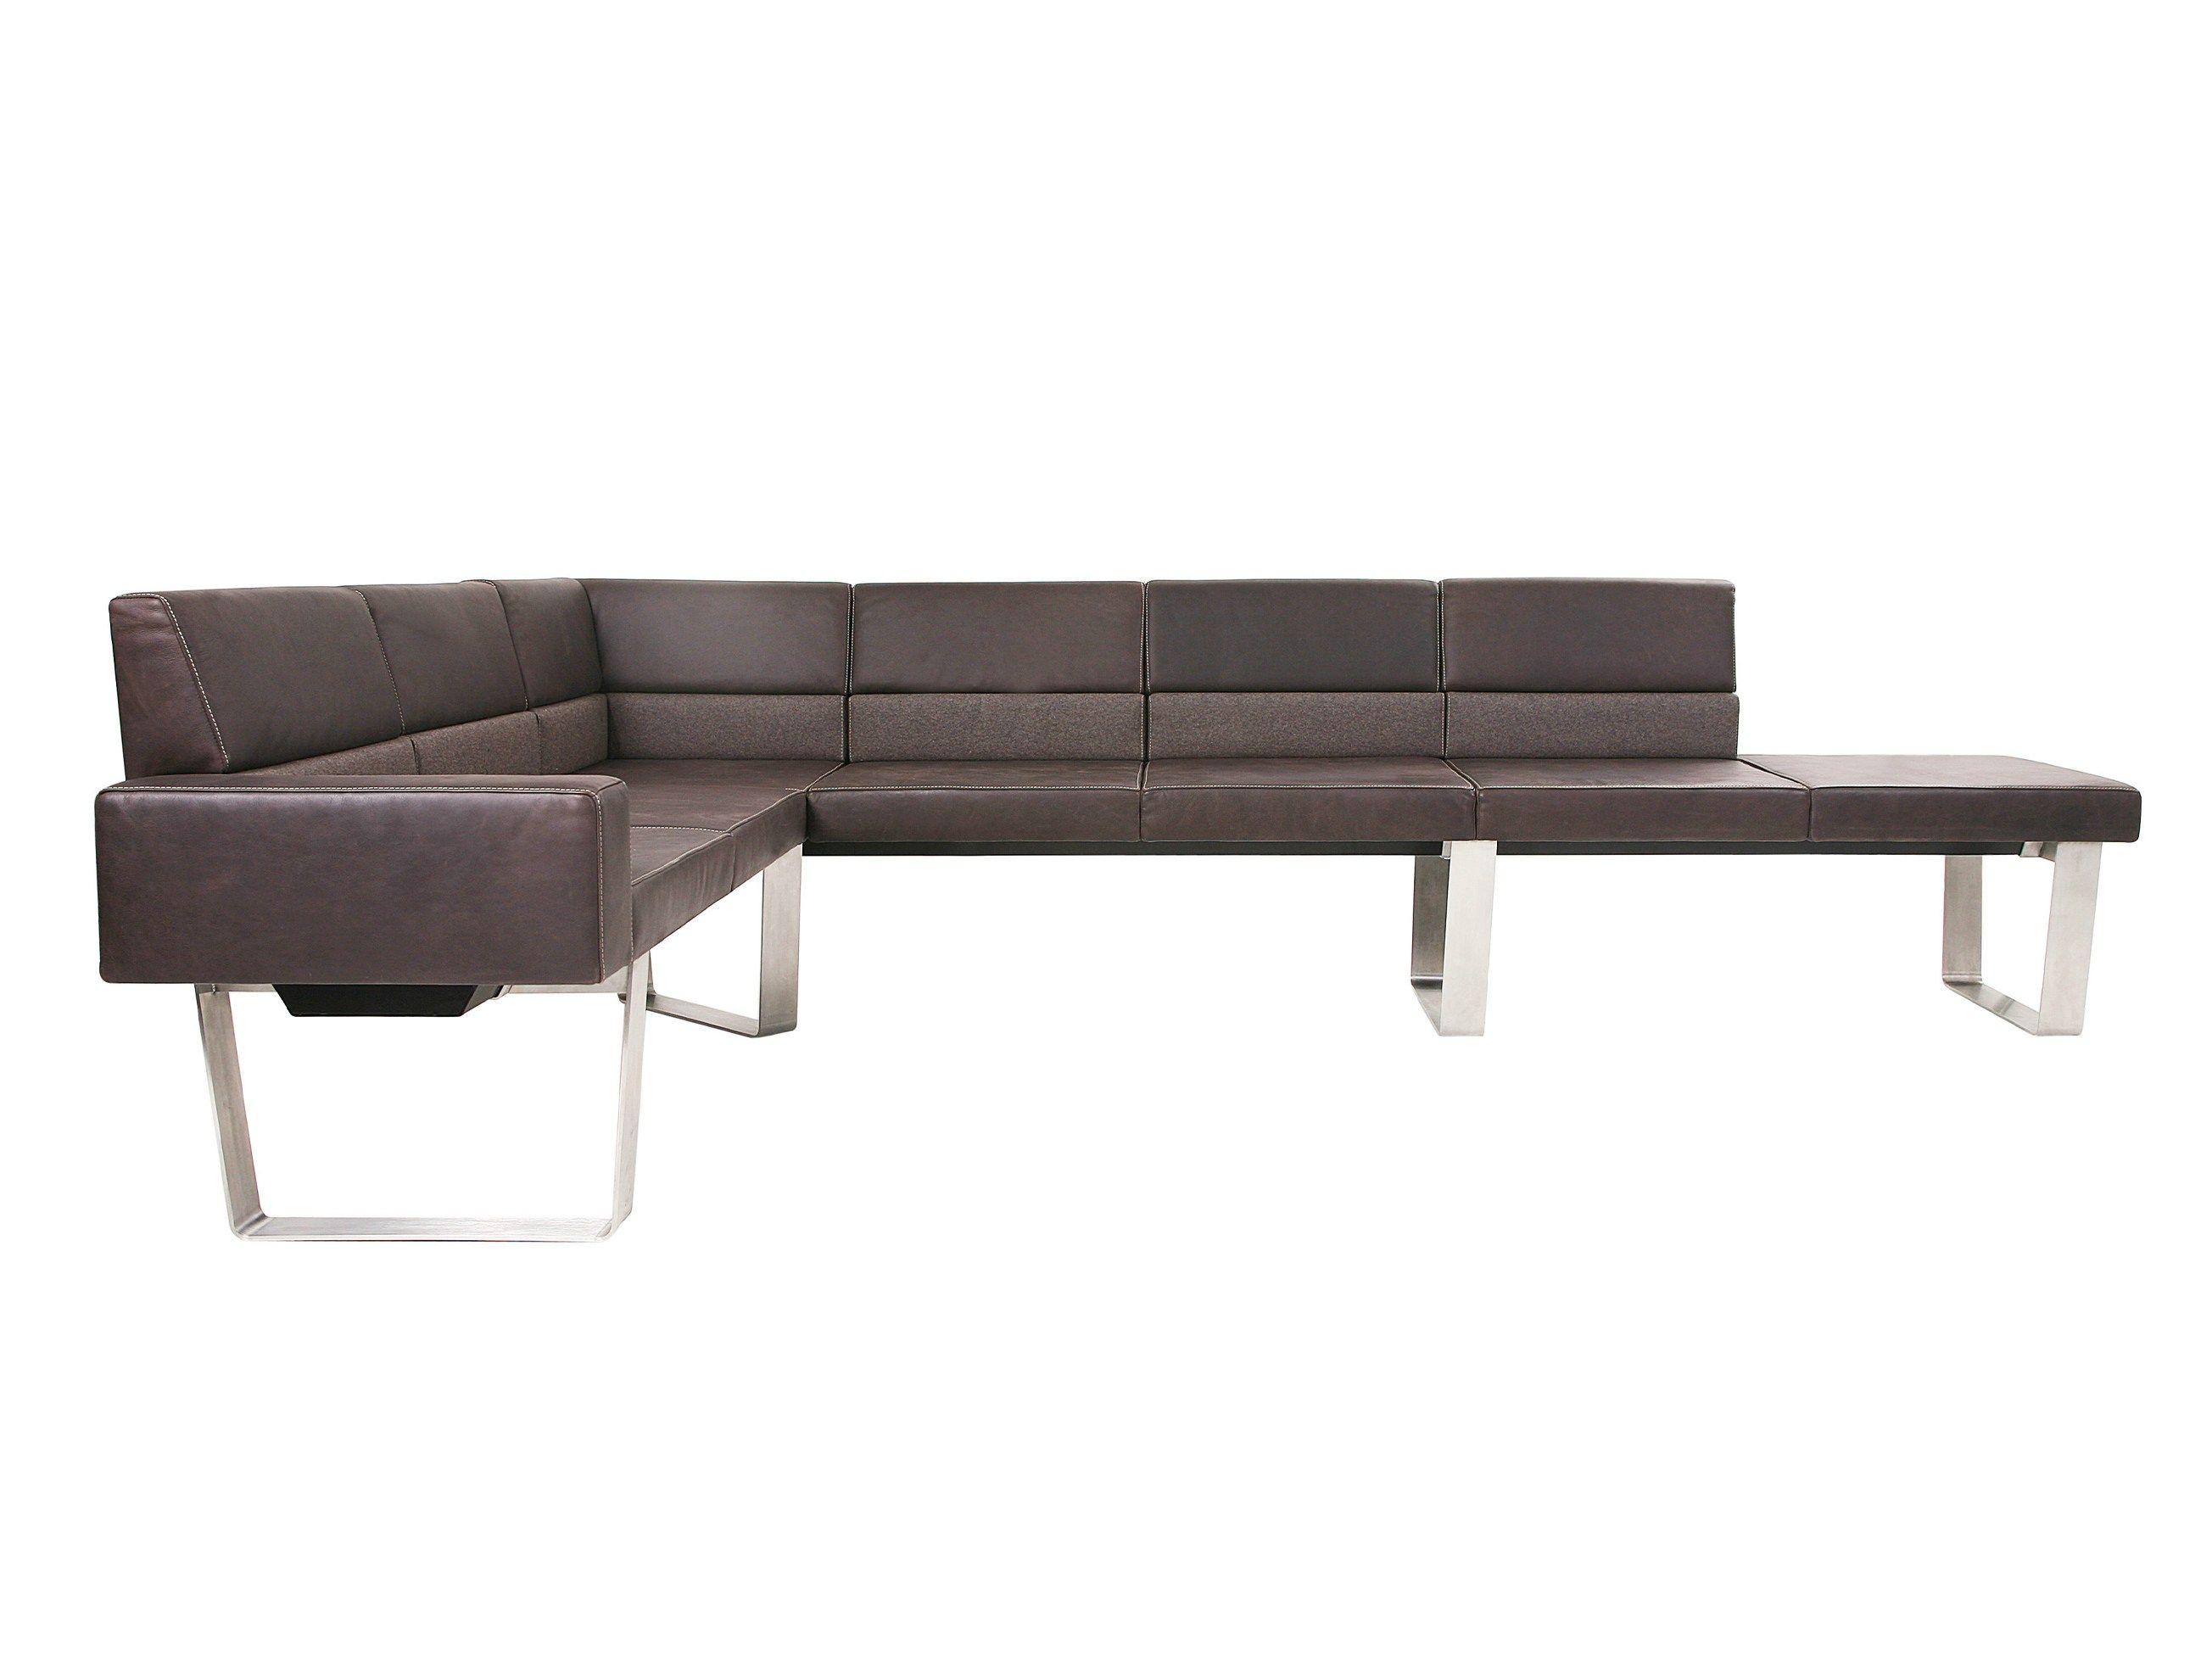 Modulares sofa aus leder bench ecksofa kollektion for Sofa aus leder